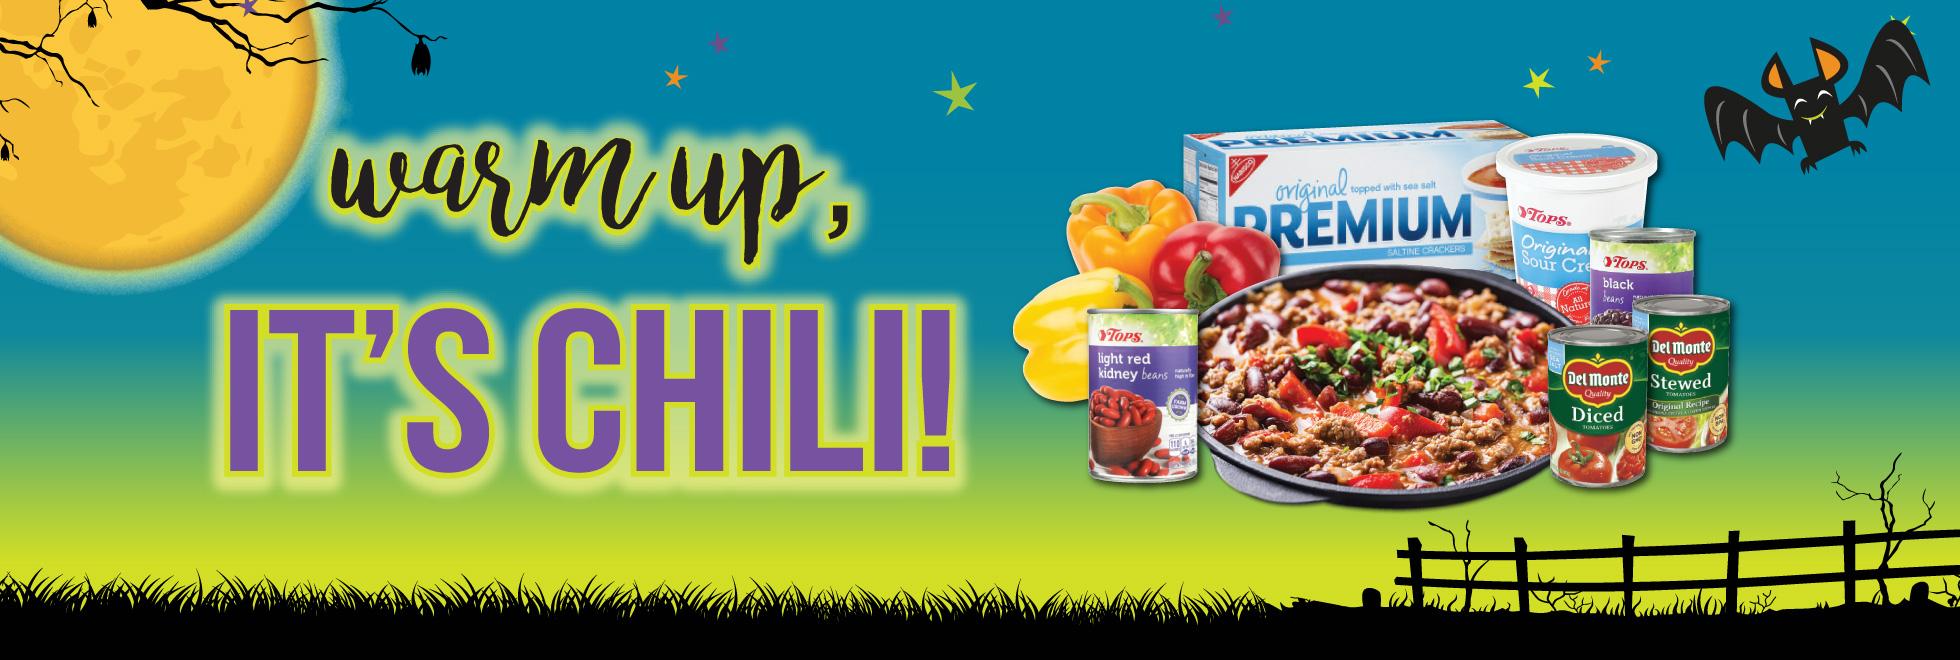 Warm up It's Chili